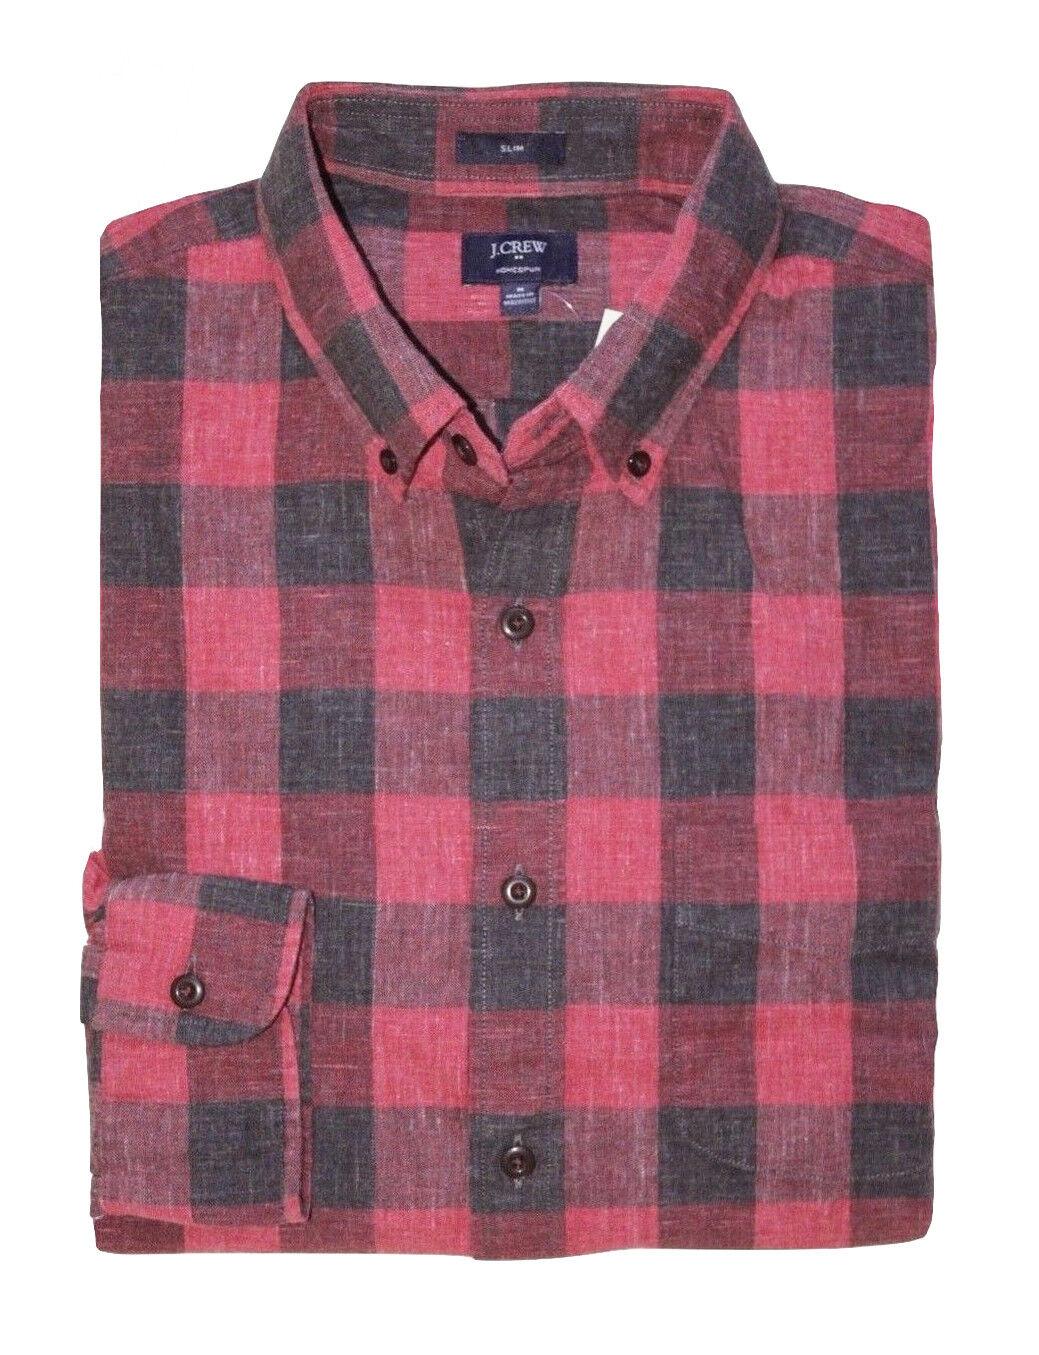 J Crew Factory - Men's XL - Slim Fit - Red Buffalo Plaid Homespun Cotton Shirt